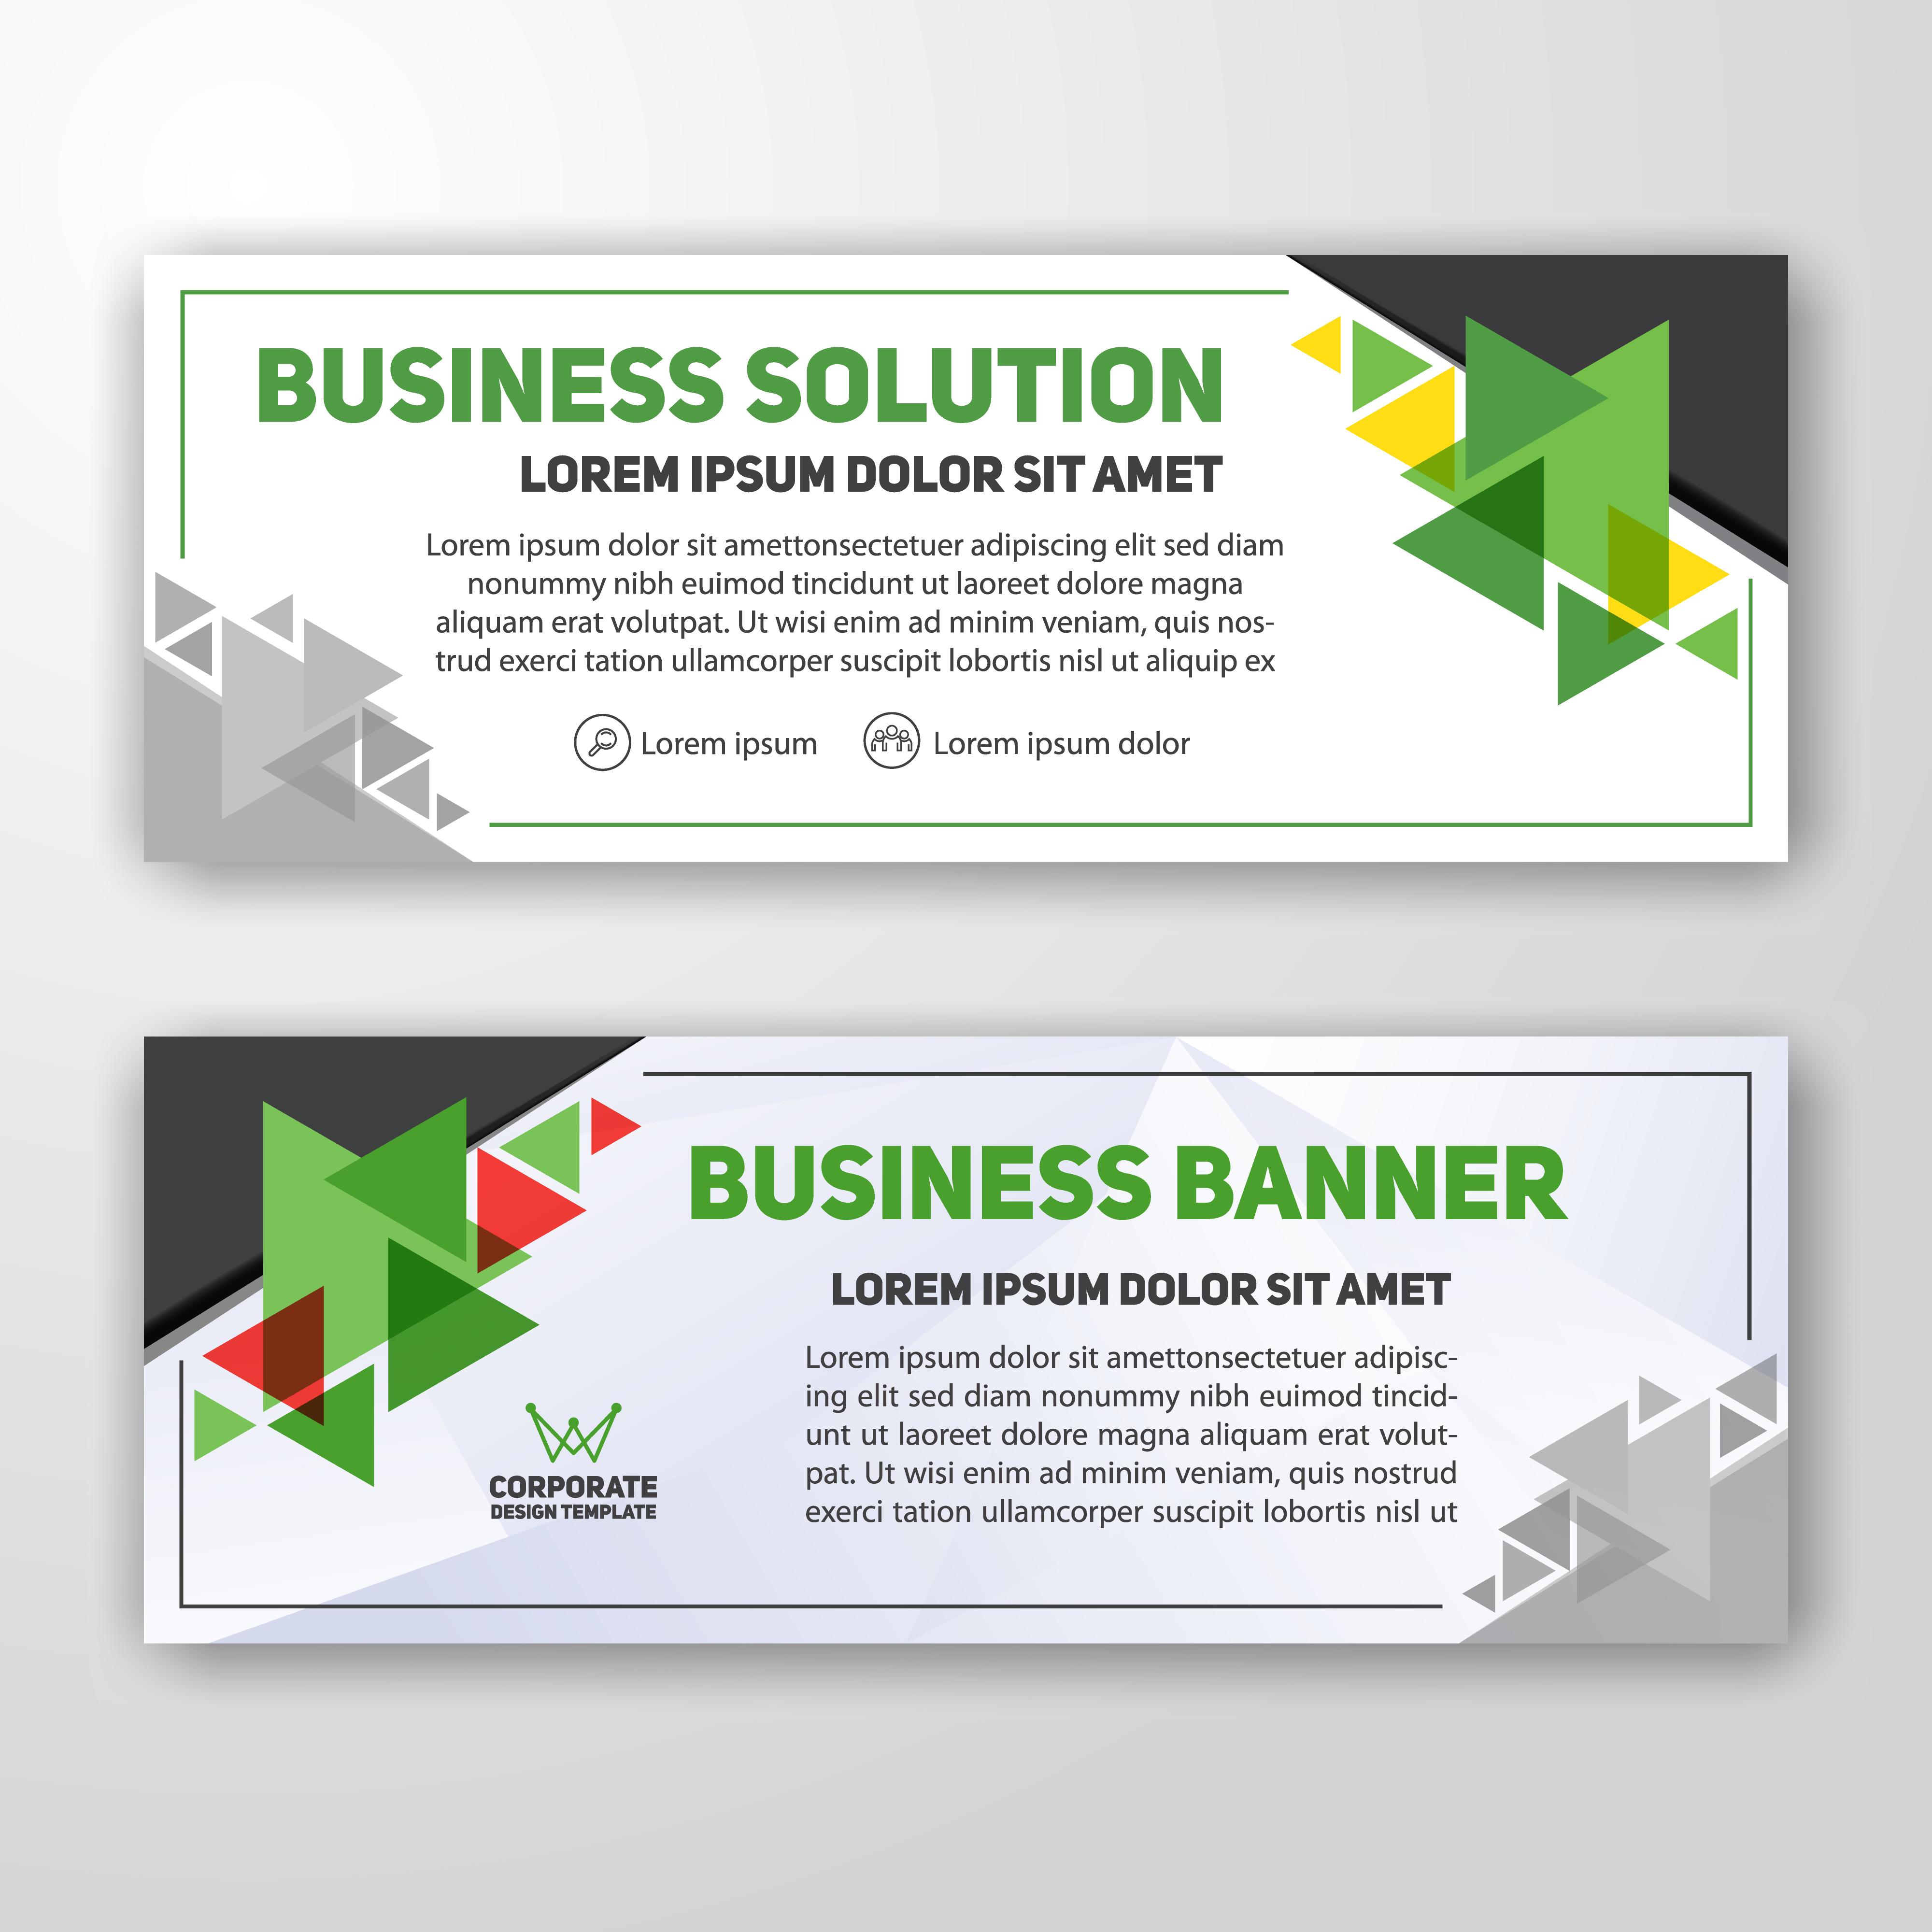 Modern corporate banner background design - Download Free ...